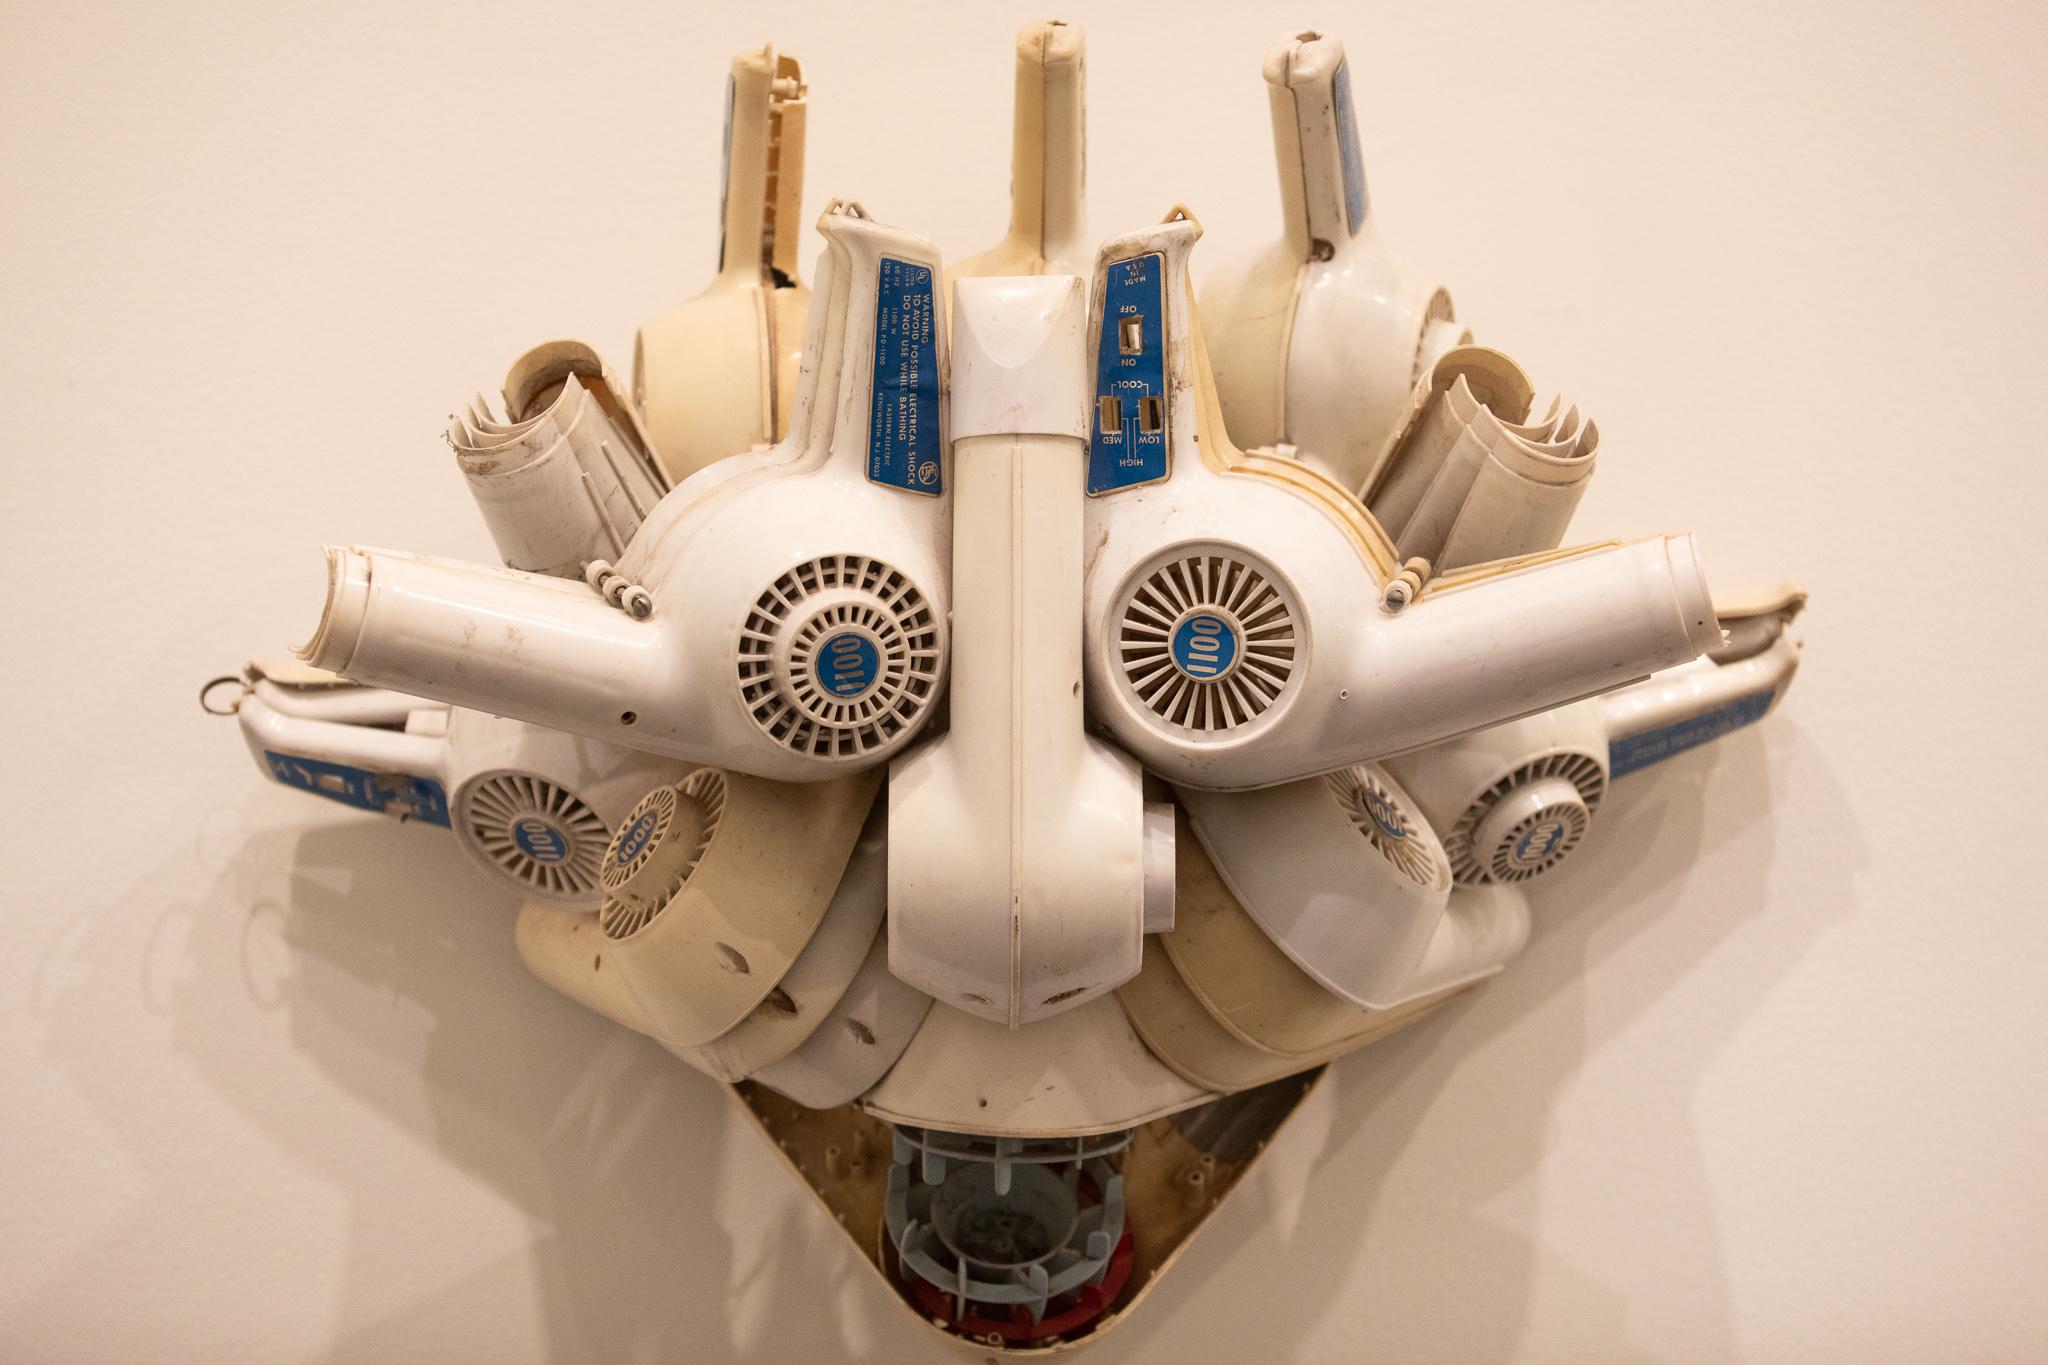 U2A3837 - Sheldon art exhibition shows waste drives human life